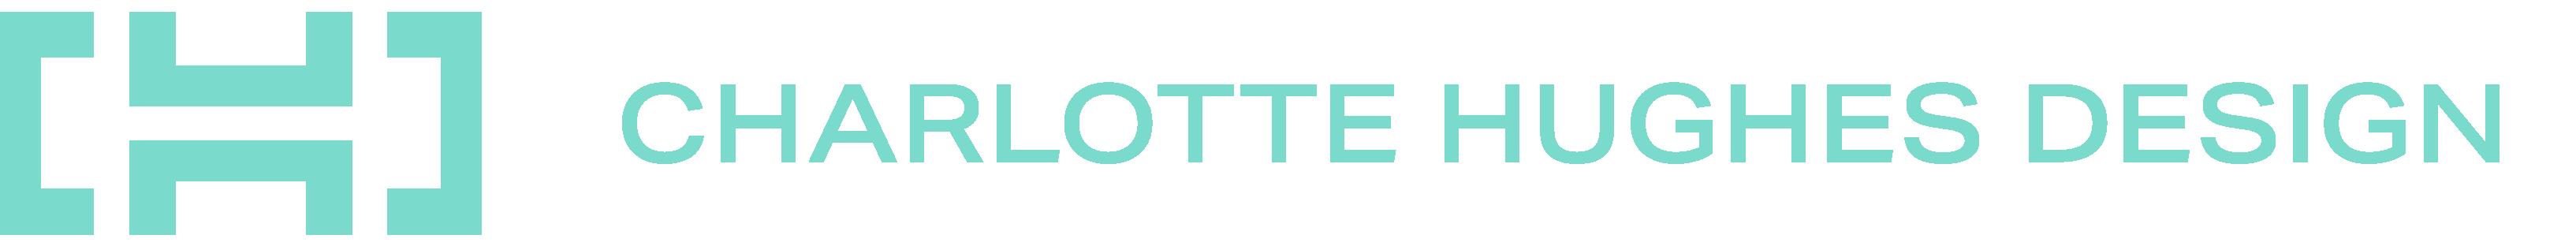 charlotte hughes // graphic designer